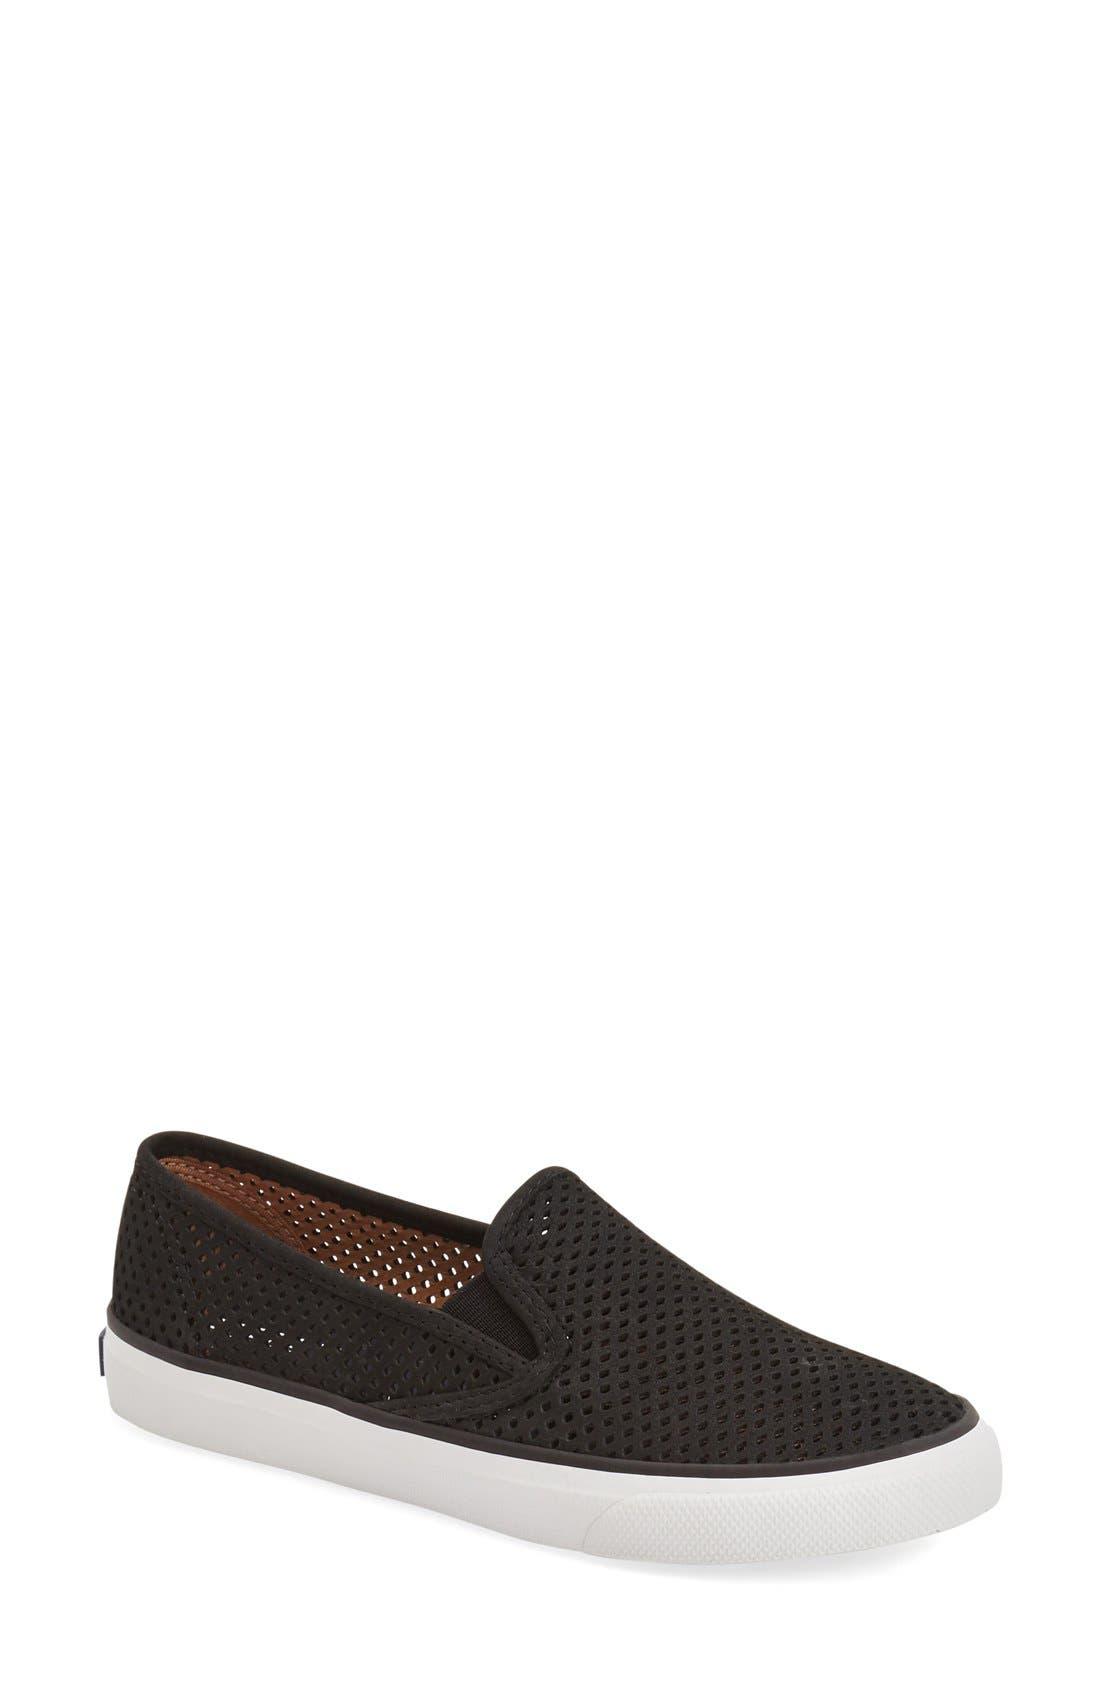 Main Image - Sperry 'Seaside' Perforated Slip-On Sneaker (Women)